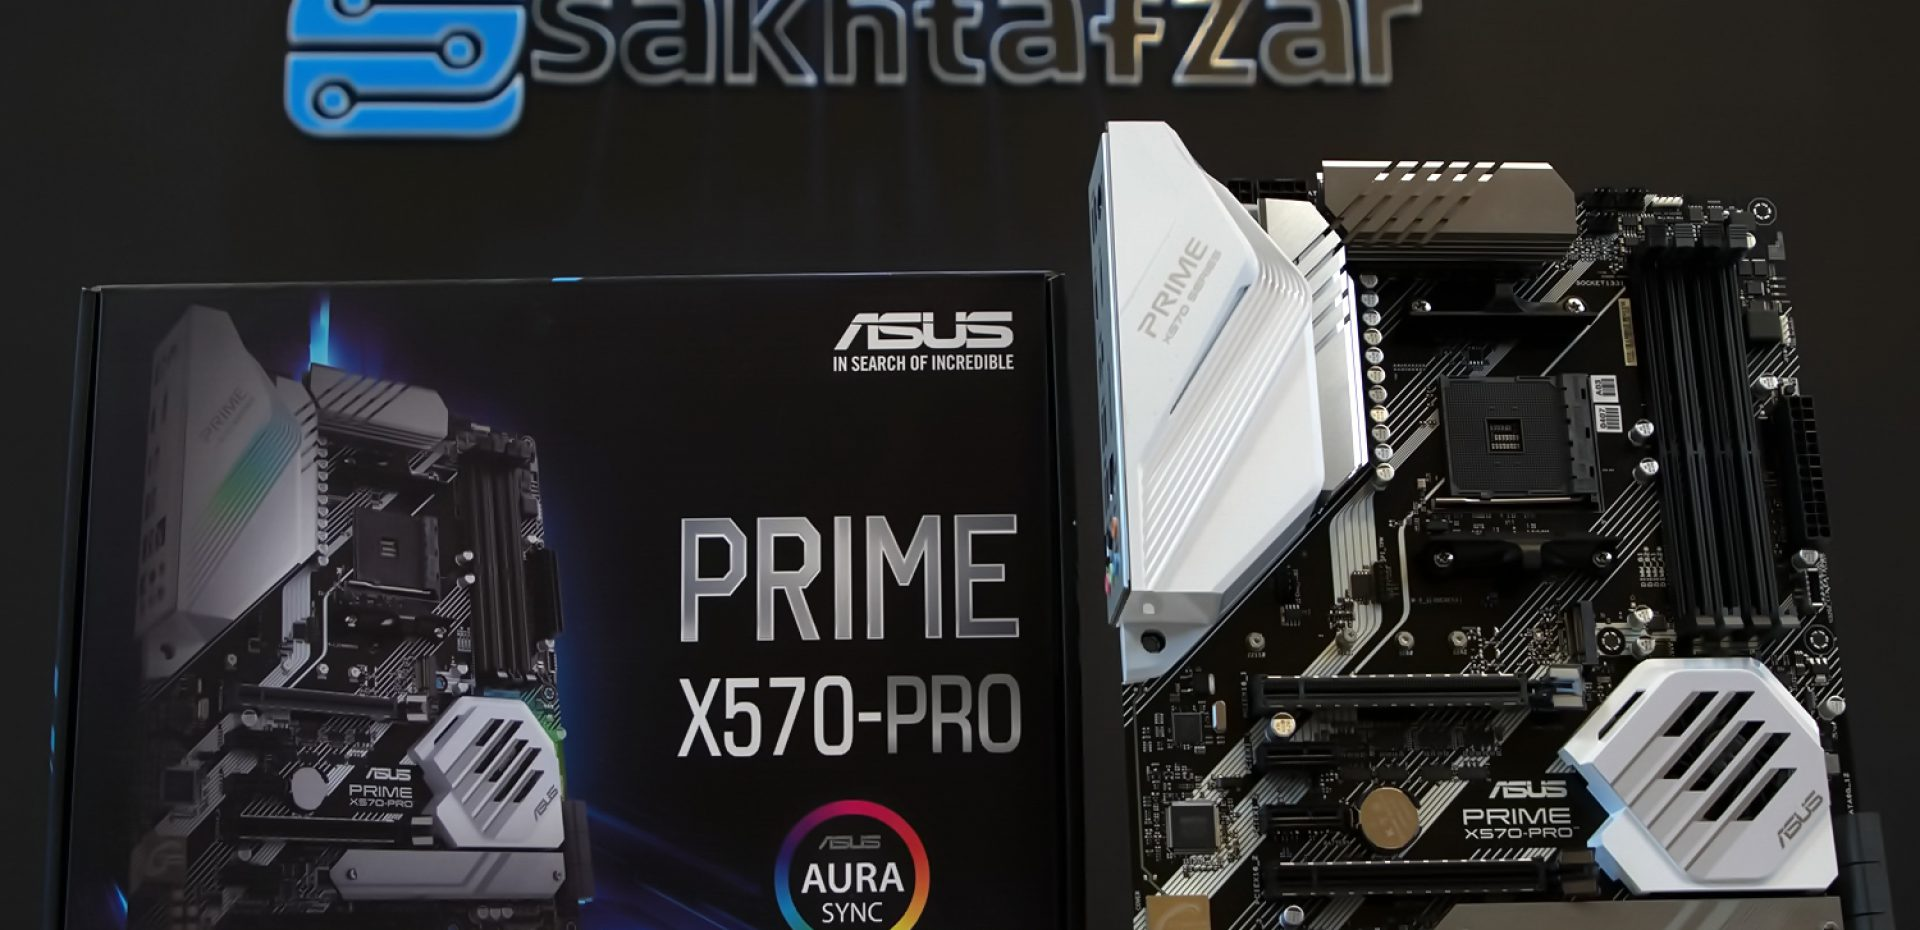 ASUS X570 PRIME PRO